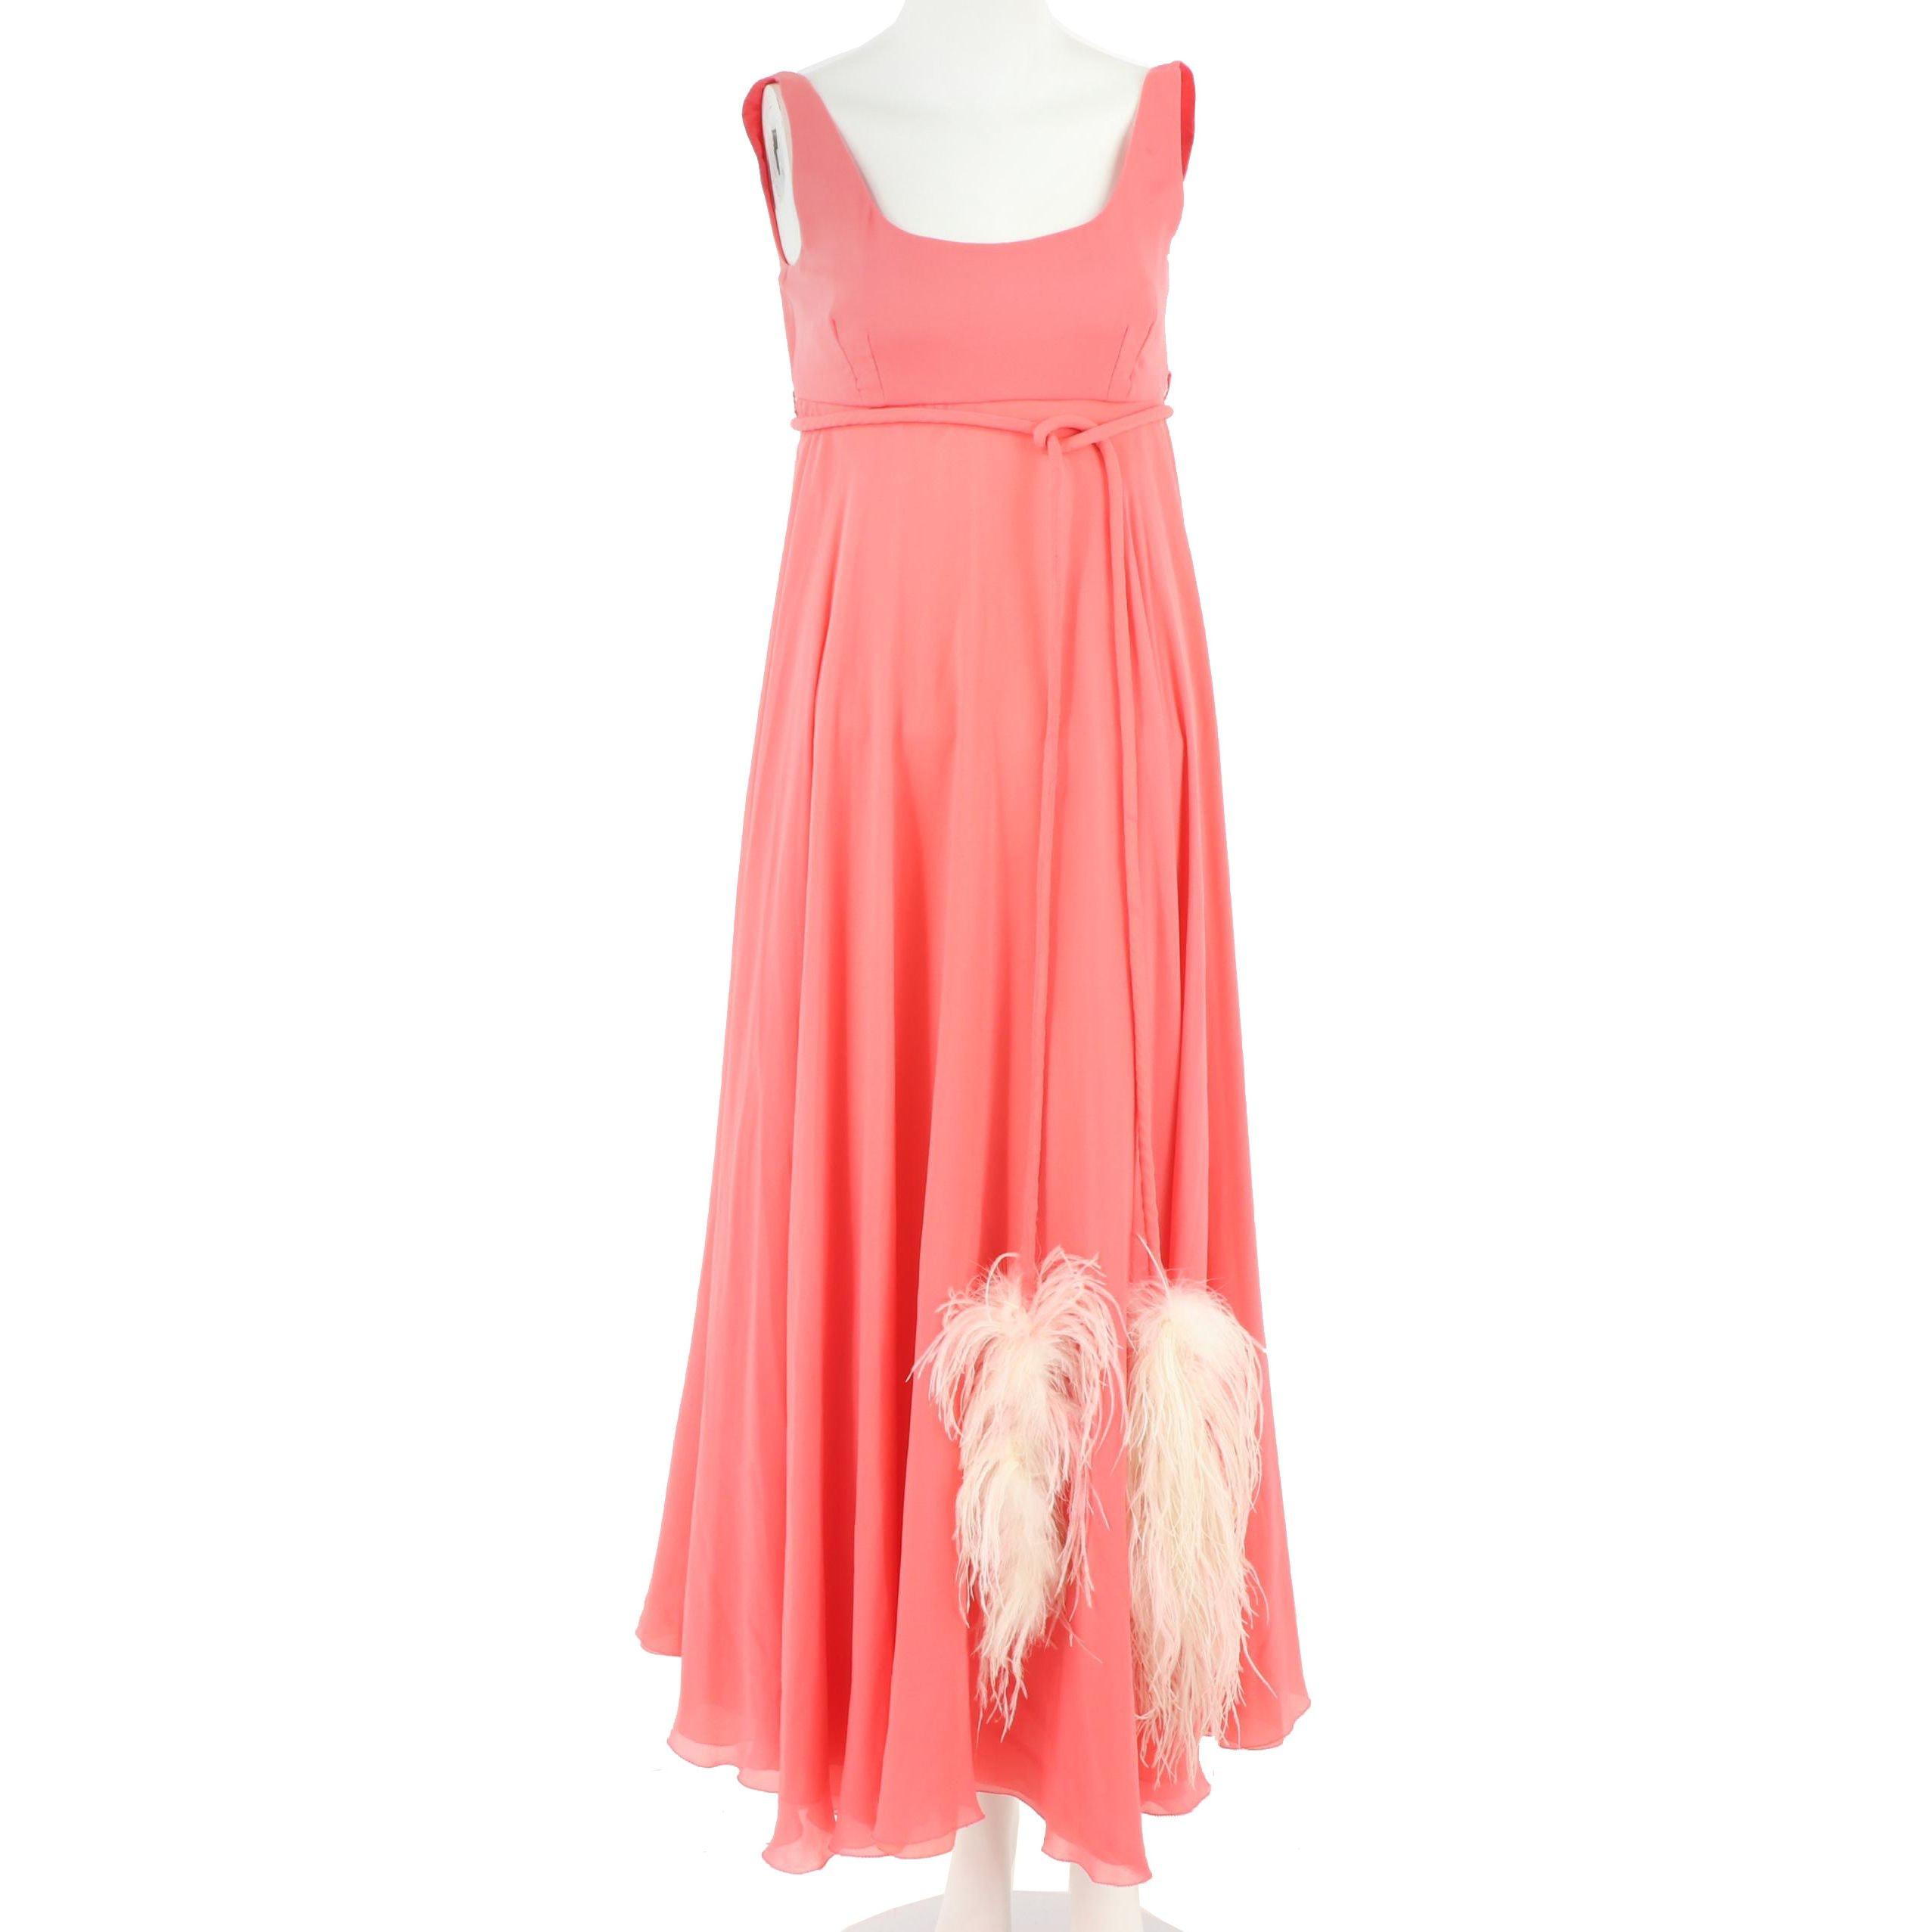 Sakowitz of Houston Coral Chiffon Dress with Ostrich Feather Belt, 1960s Vintage